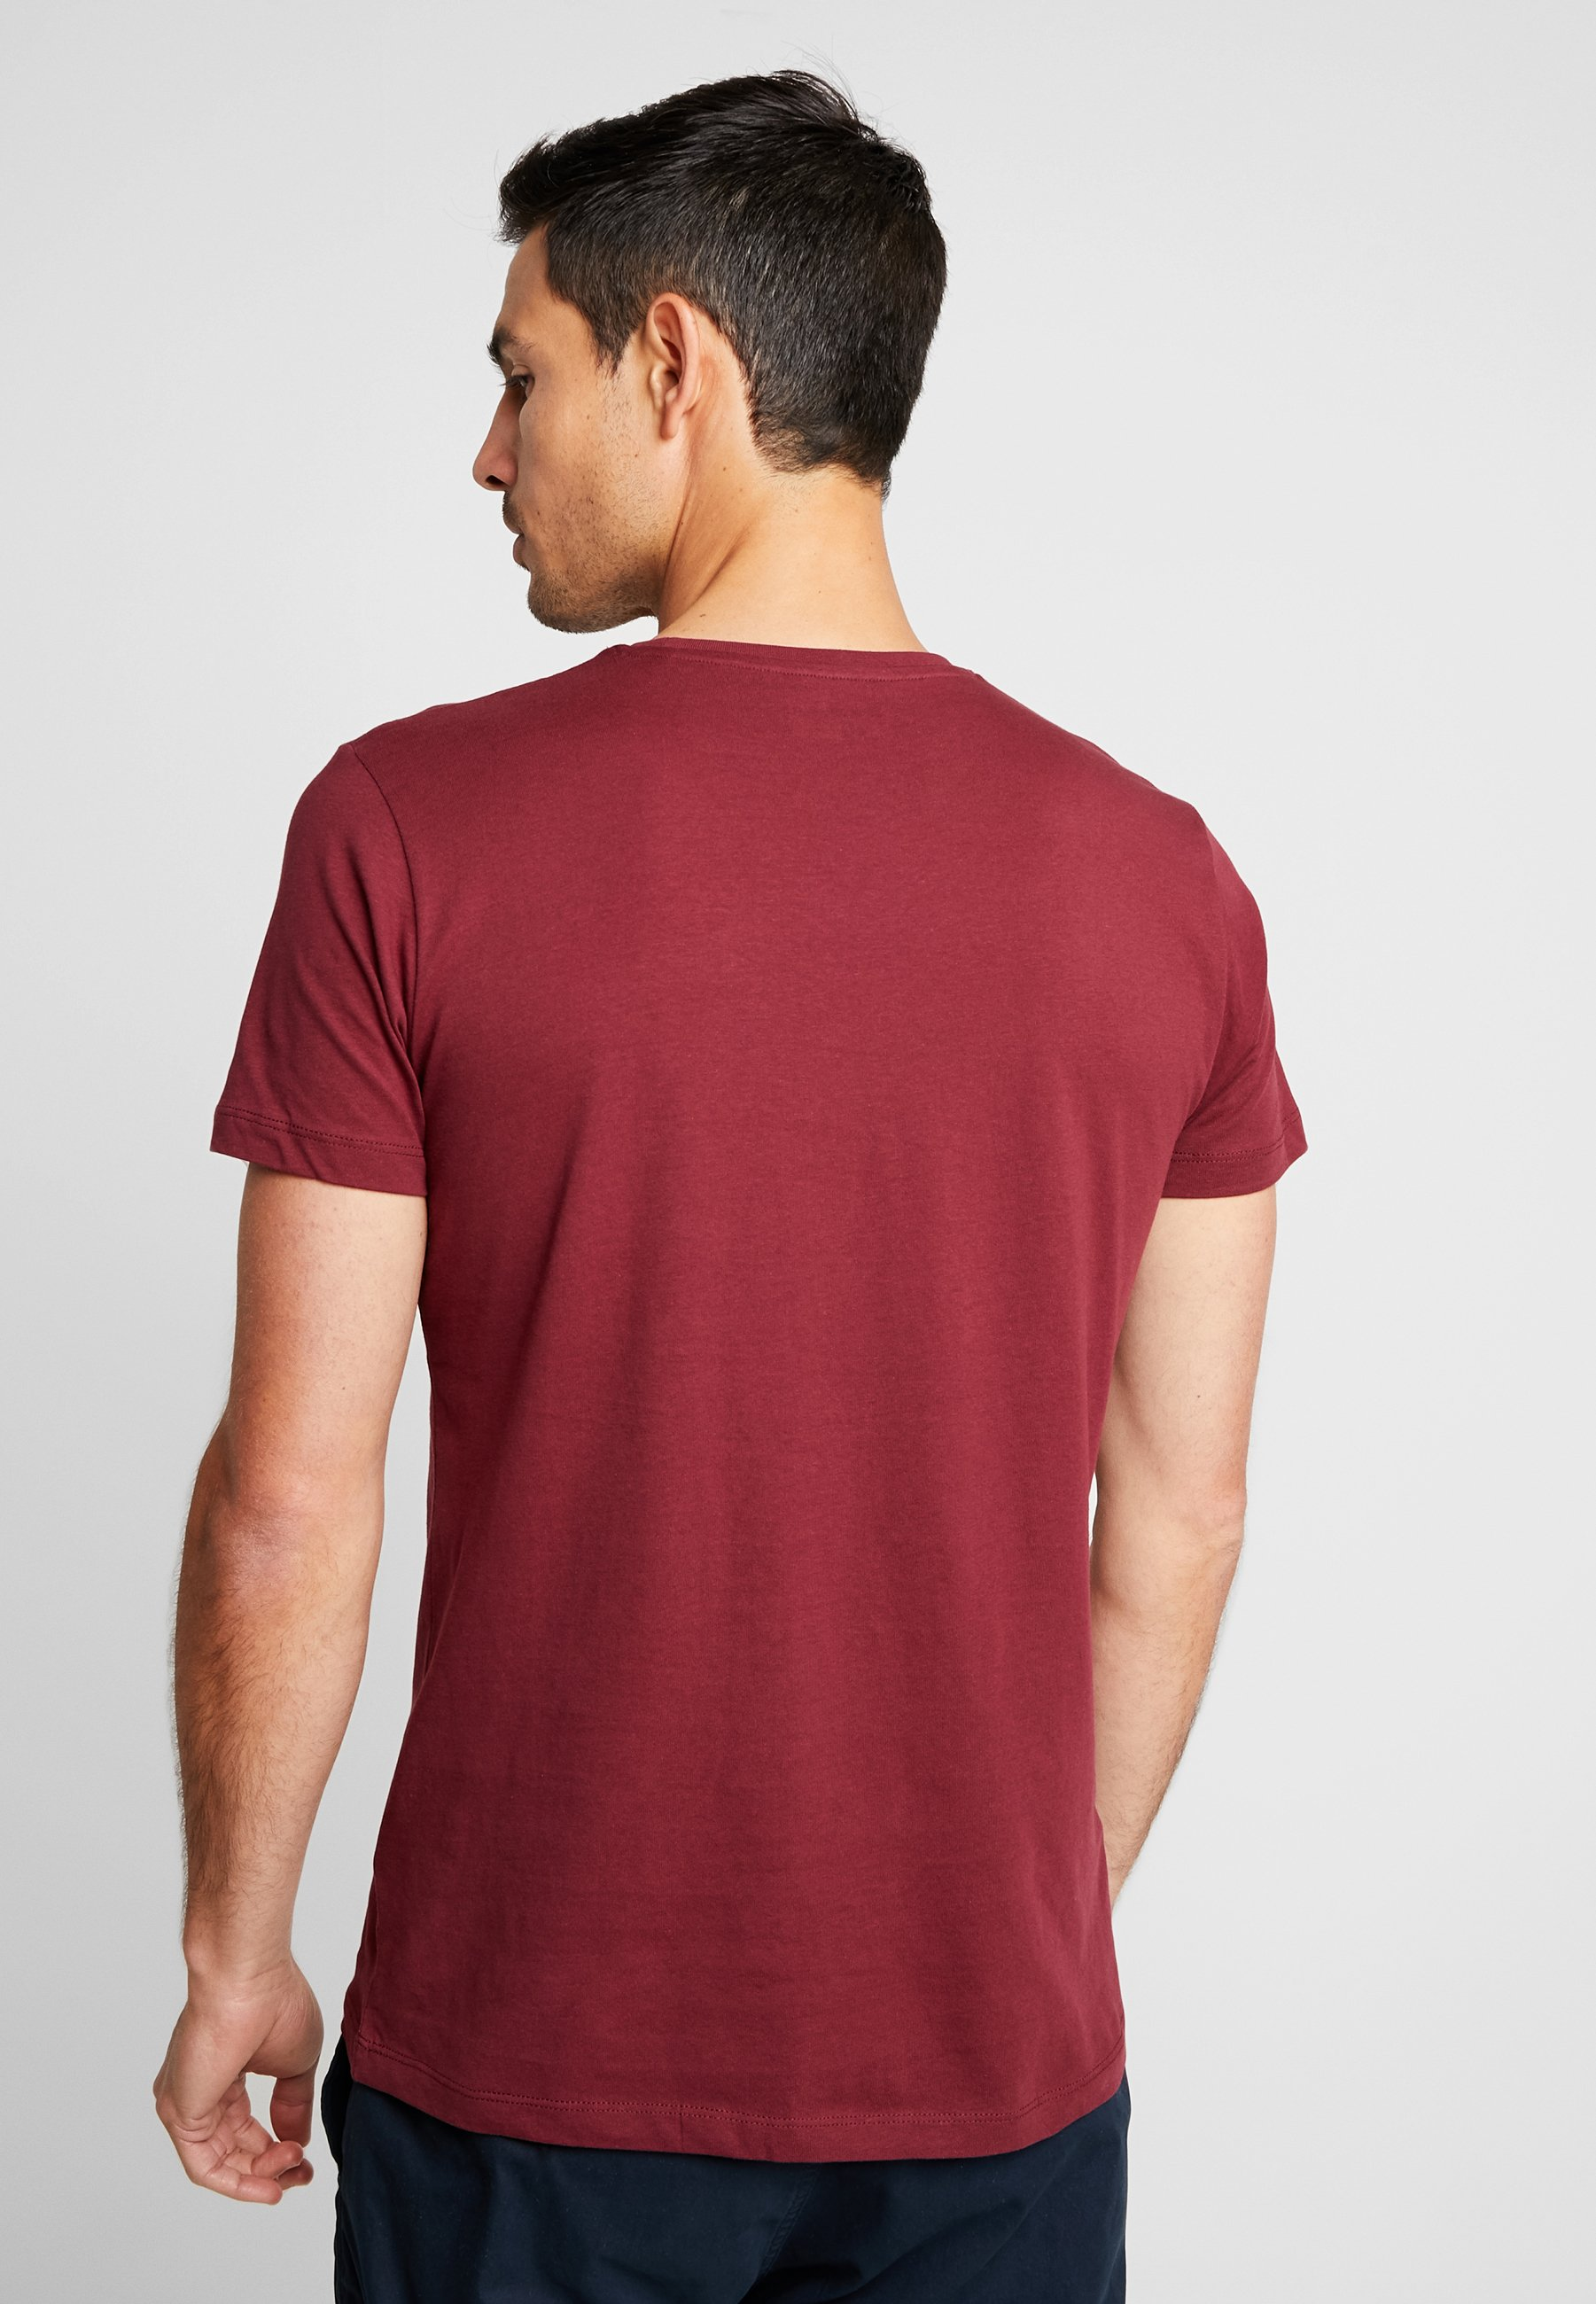 PackT Basic Bordeaux shirt 2 Red Esprit T1FJlKc3u